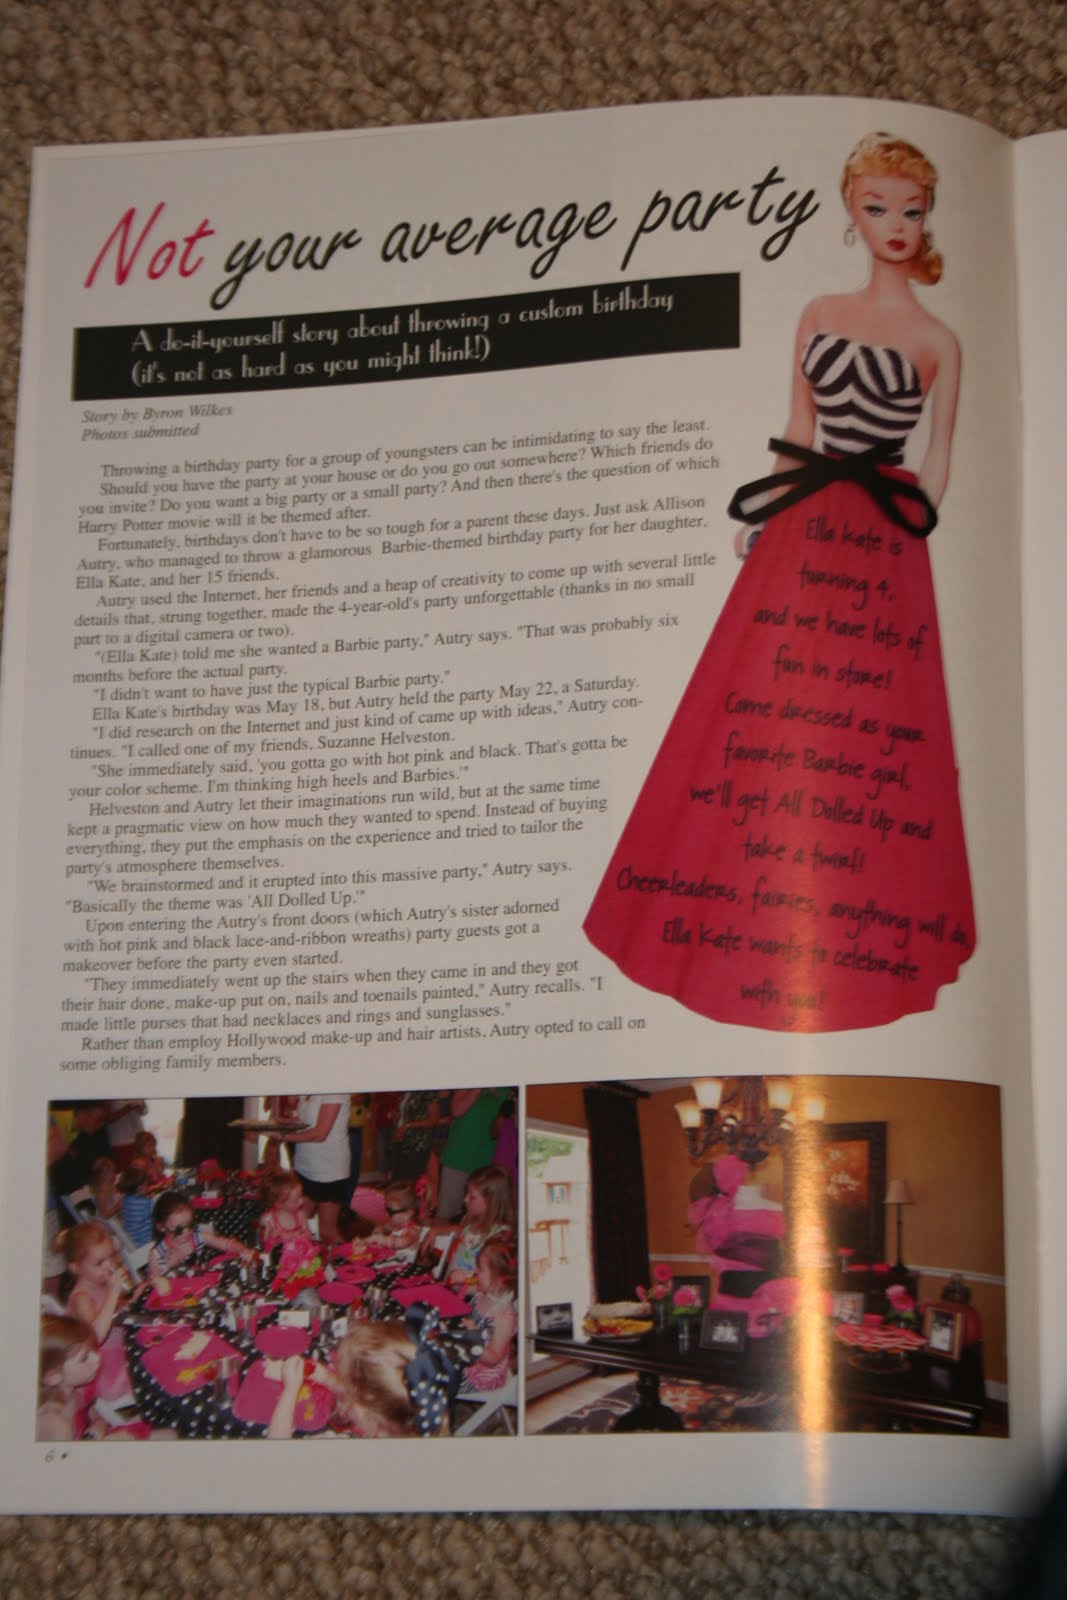 Family magazine articles